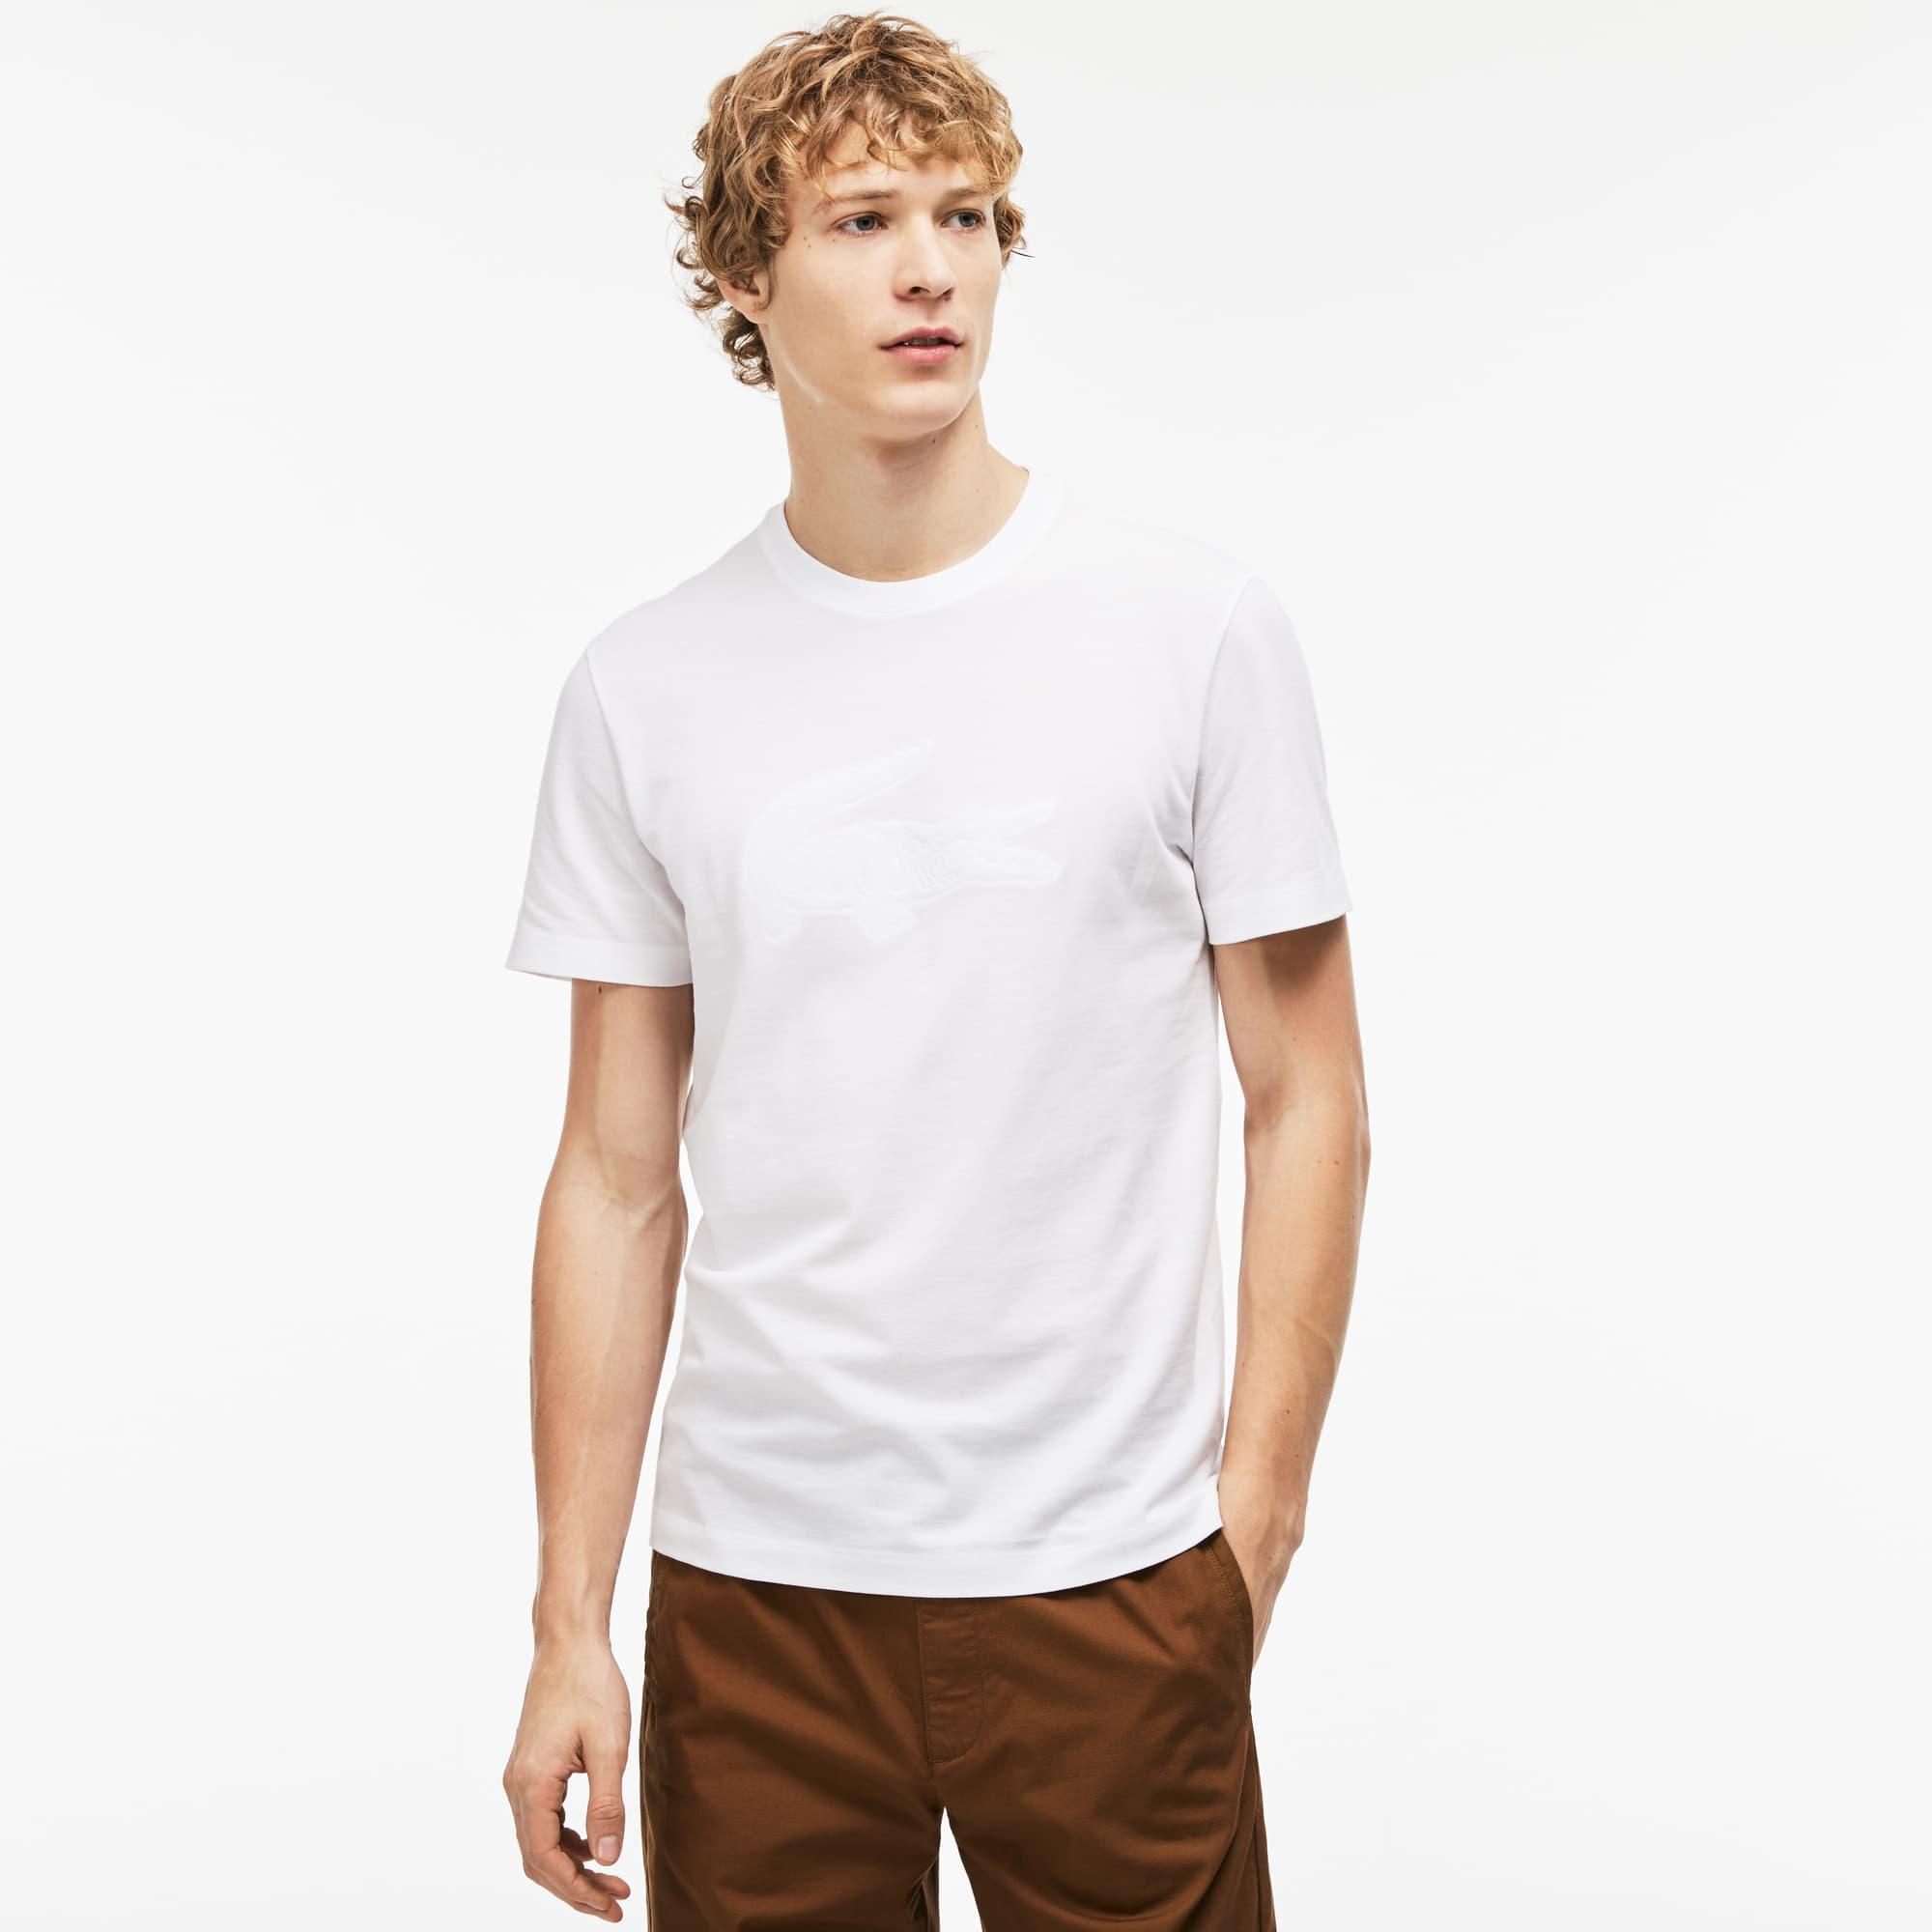 Men's Crew Neck Crocodile Embroidery Cotton Mini Piqué T-shirt